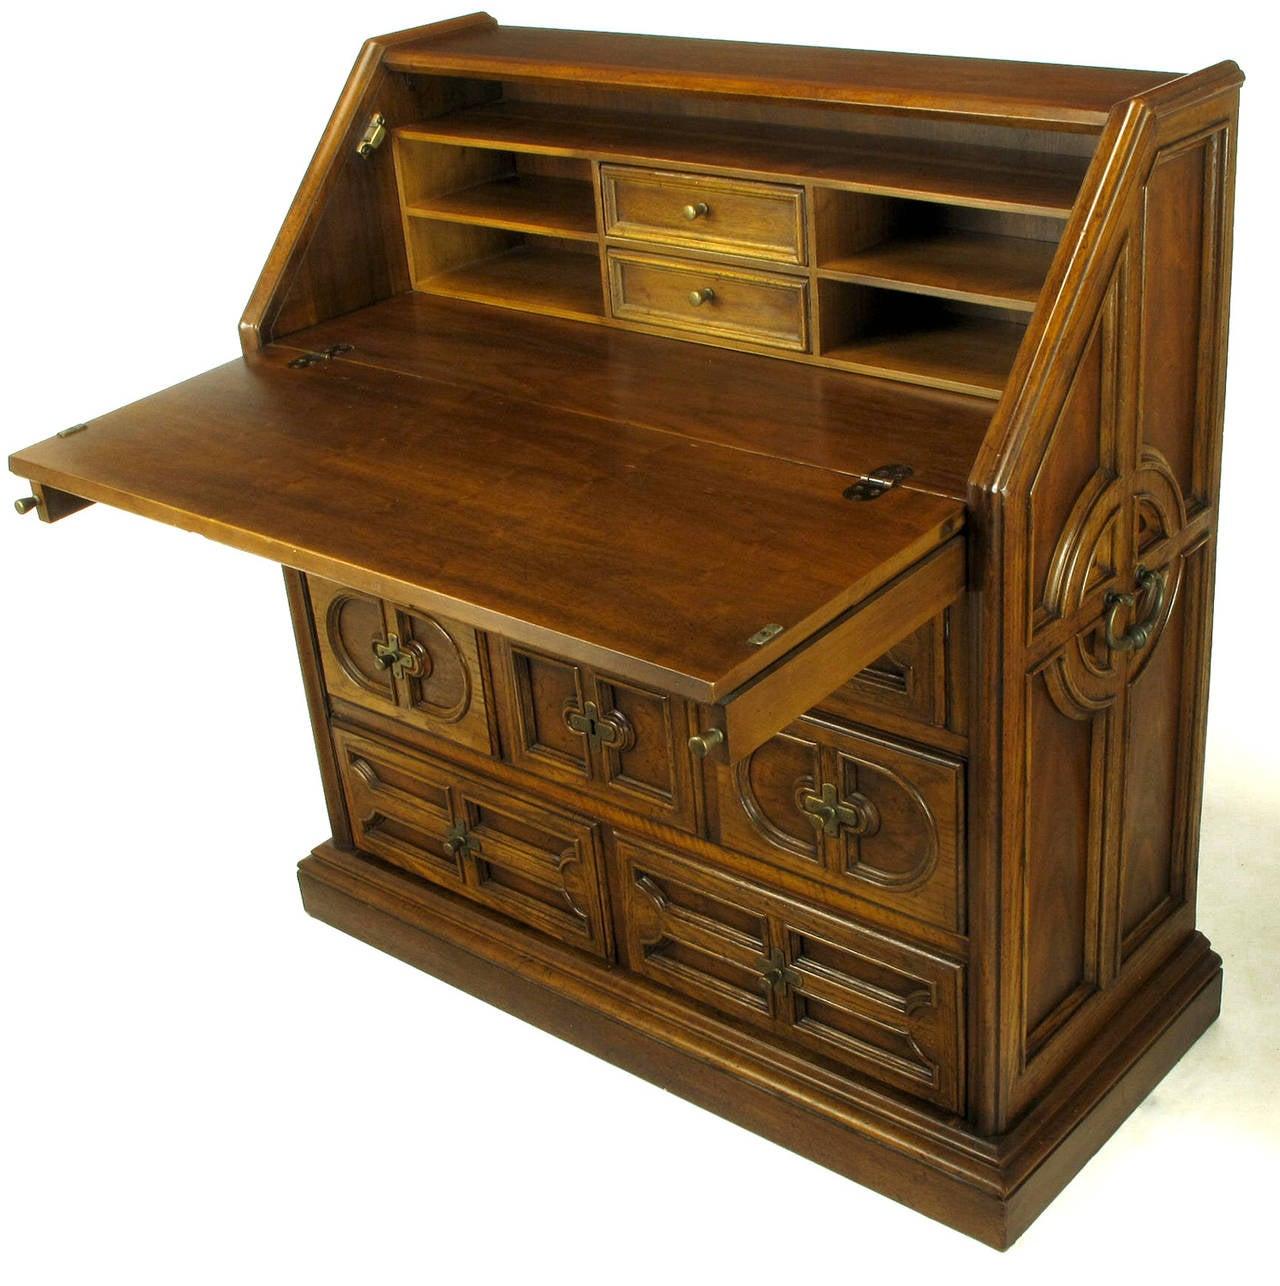 Drexel Sandia Collection Jacobean Drop Front Desk For Sale At 1stdibs